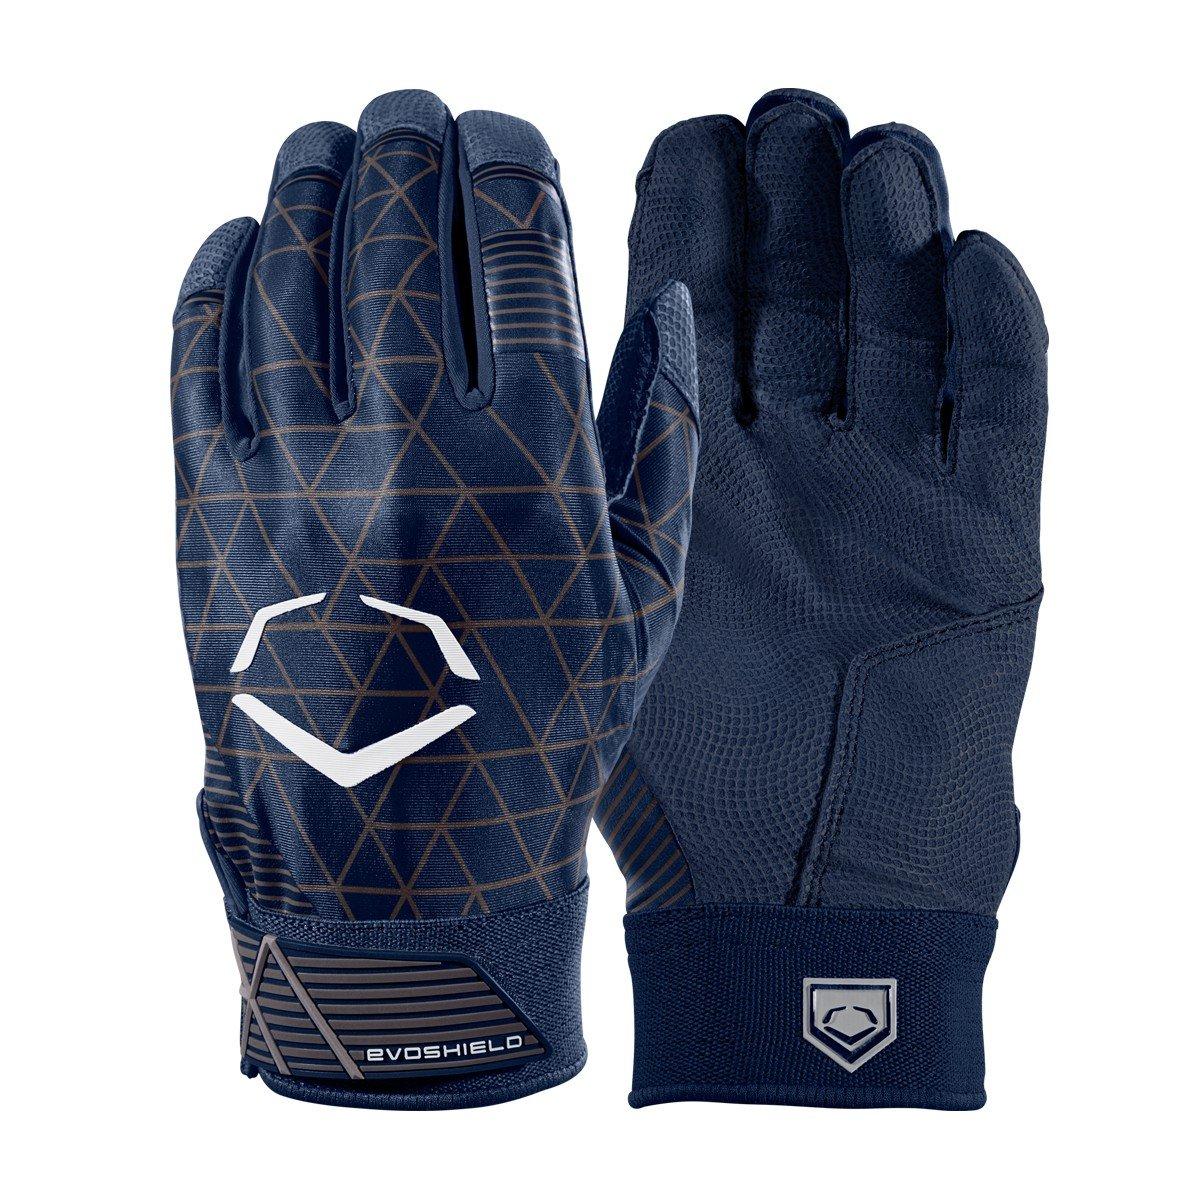 Evoshield evocharge保護用バッティング手袋 B0741HCMPL Small|ネイビー|アダルト ネイビー Small